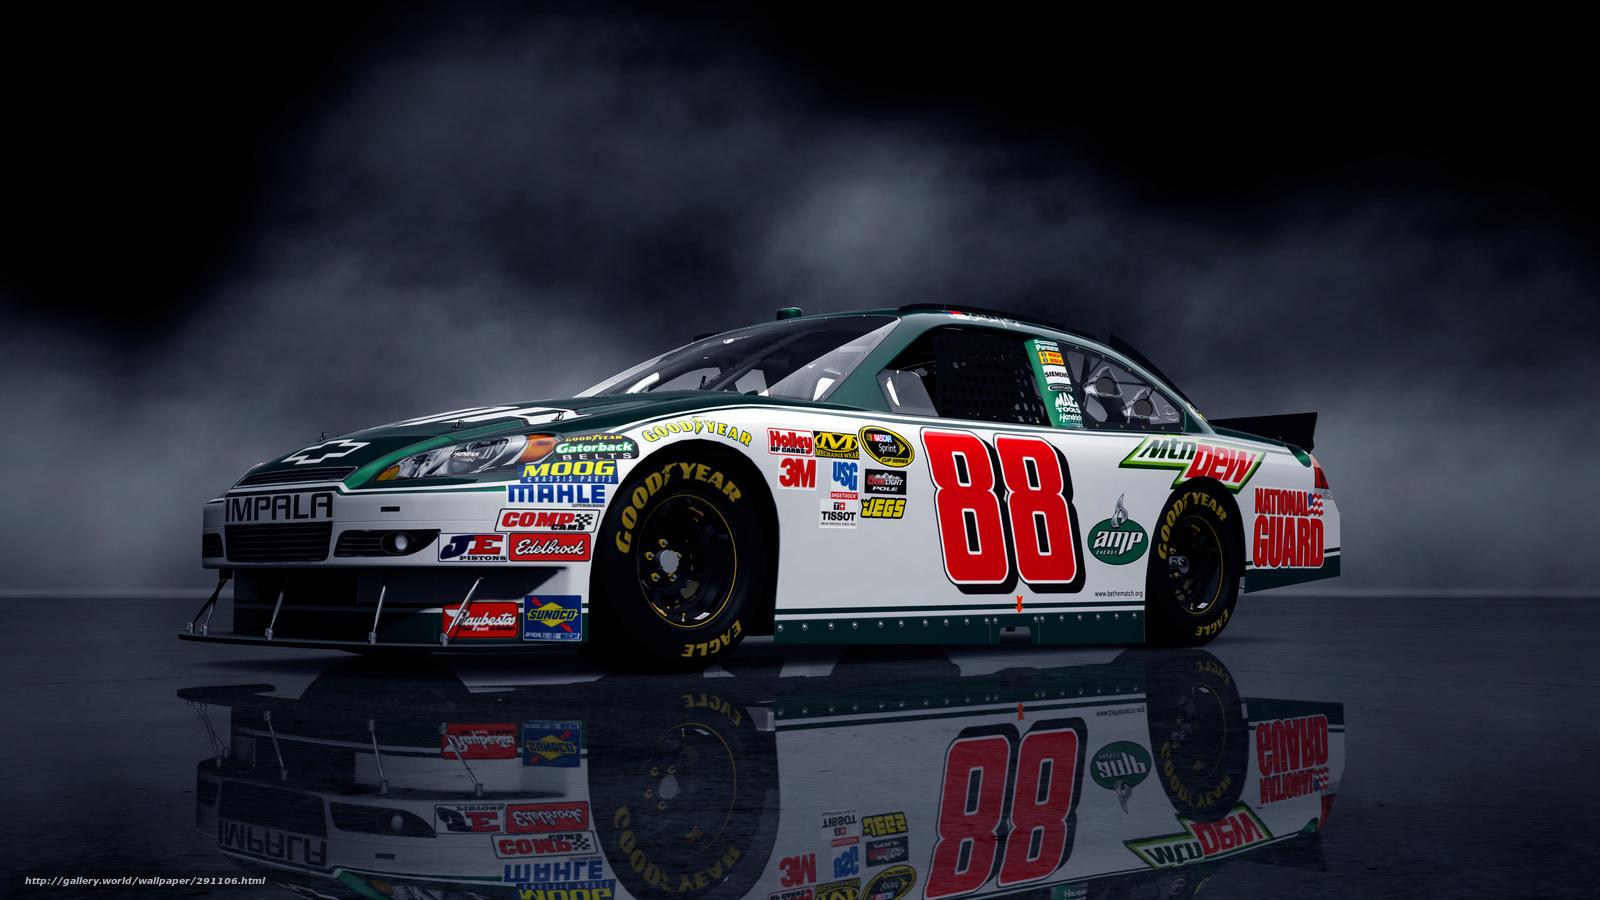 NASCAR Dale Earnhardt Jr